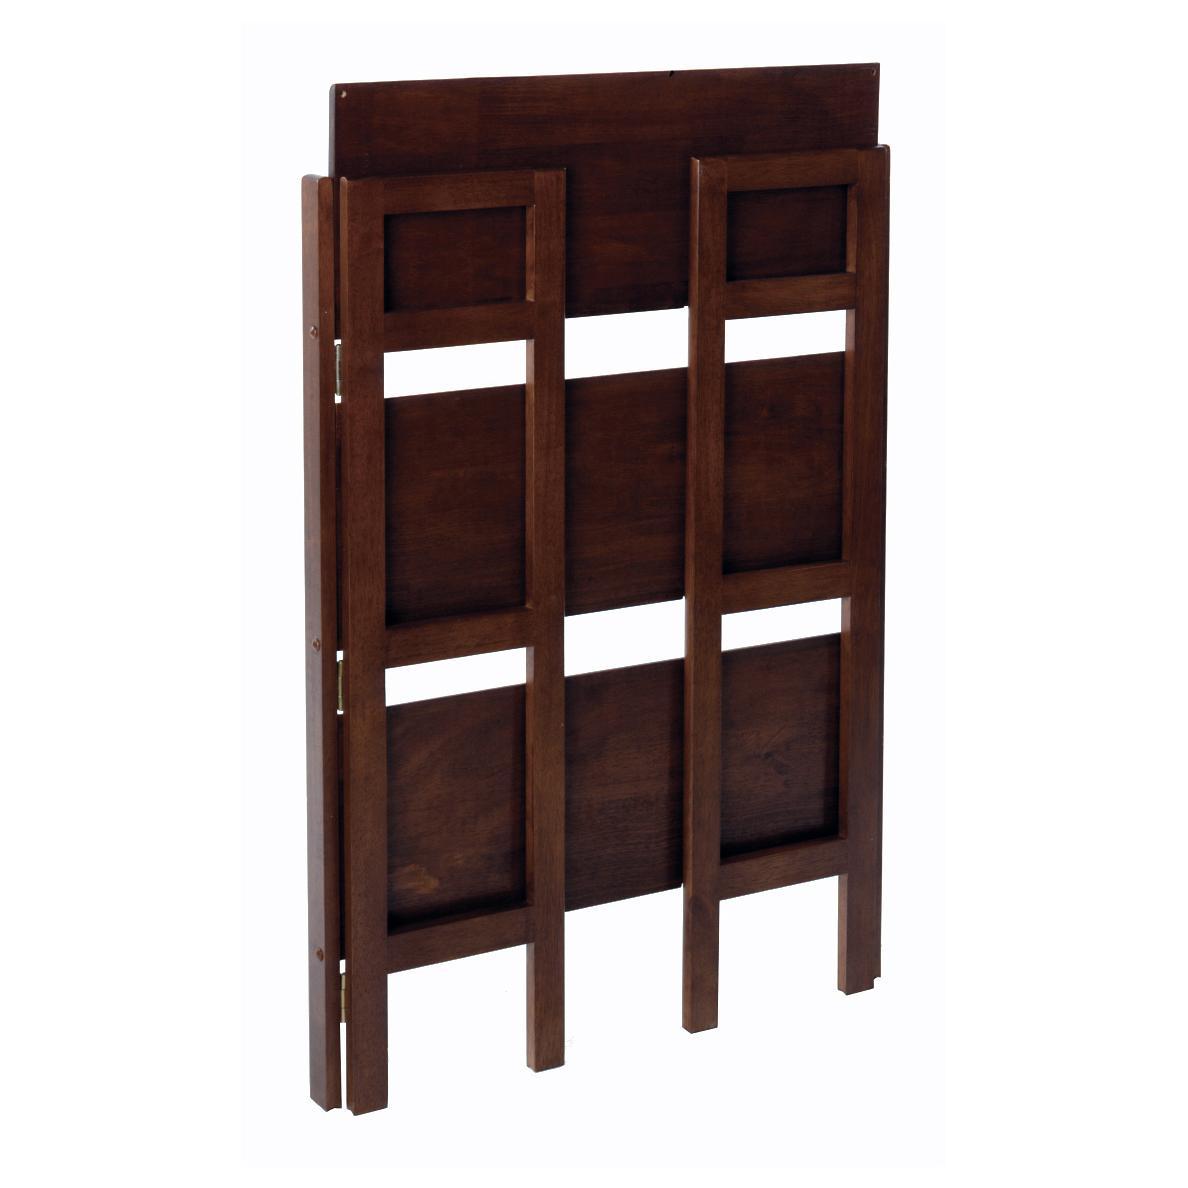 Kitchen Shelf Amazon: Amazon.com: Stackable/Folding Shelf 3-Tier: Kitchen & Dining